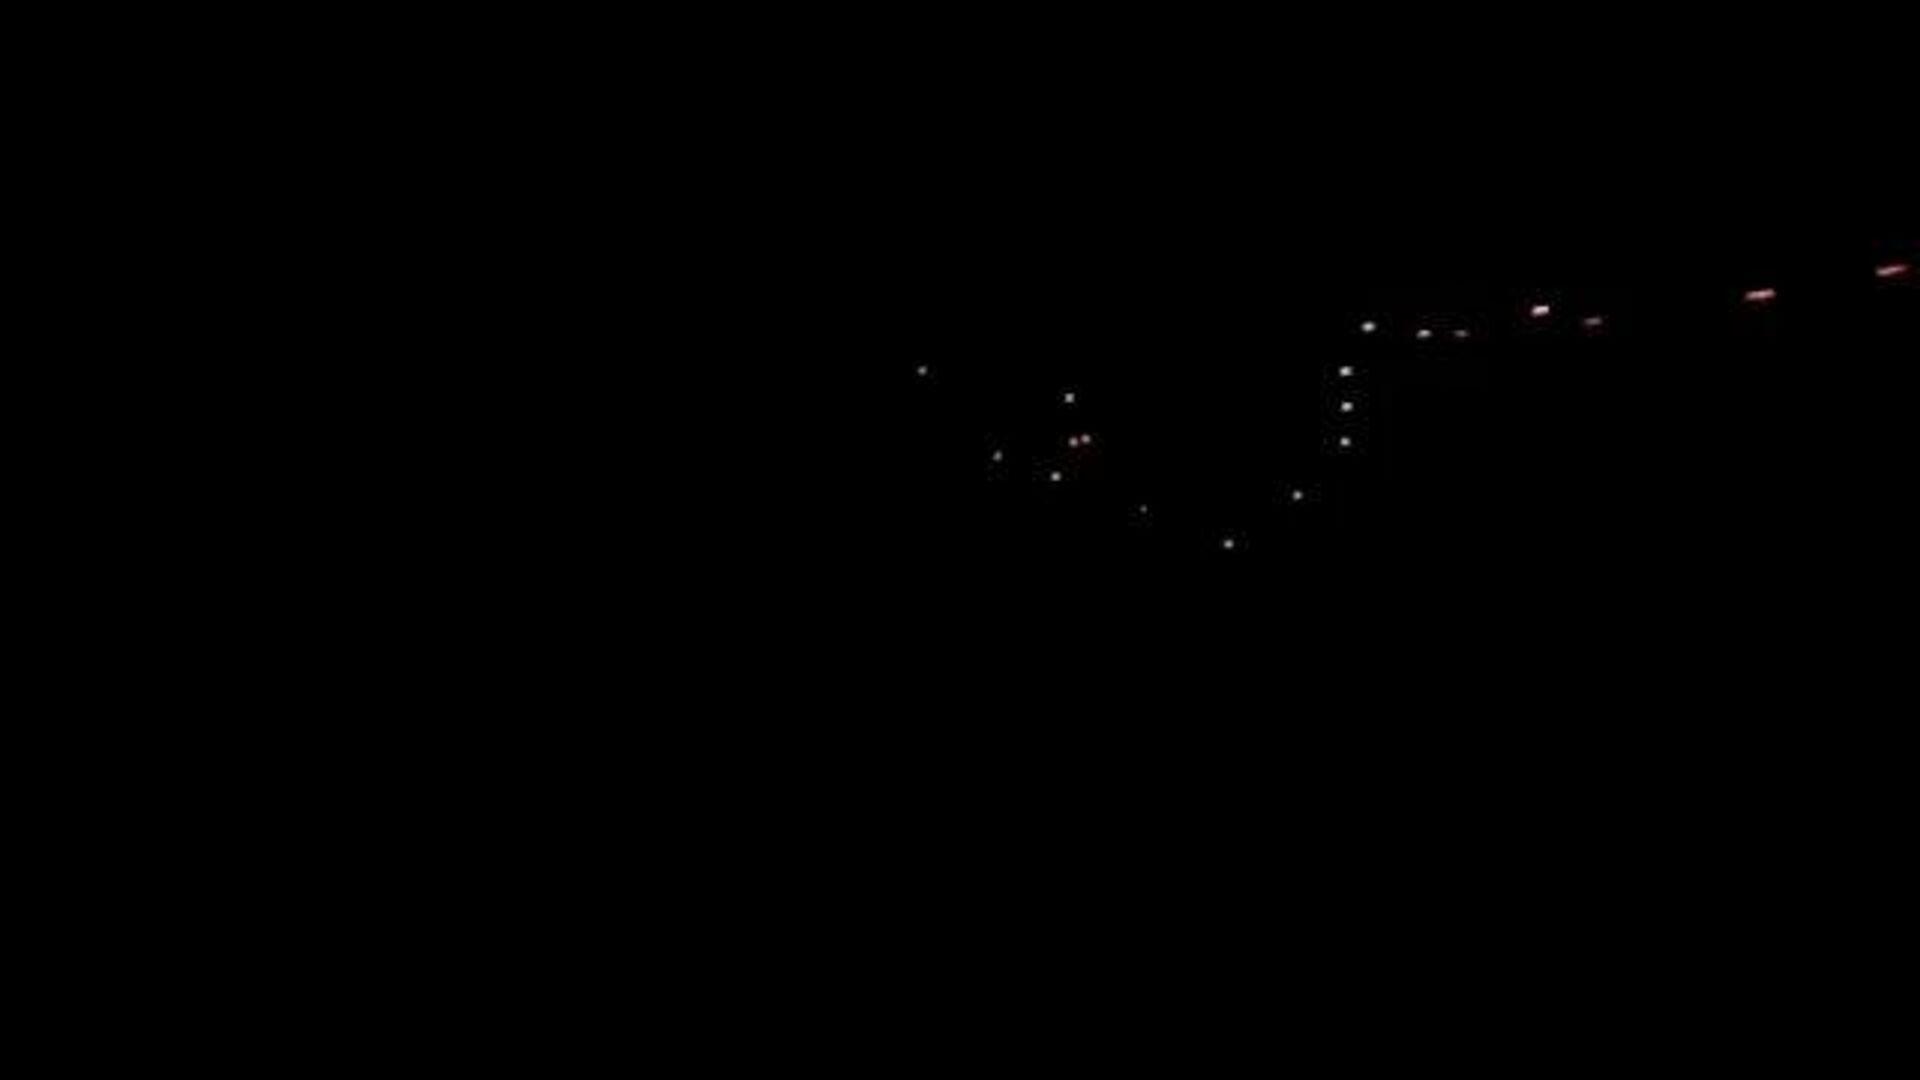 Стрельба в воздух в Кабуле  - Sputnik Таджикистан, 1920, 04.09.2021